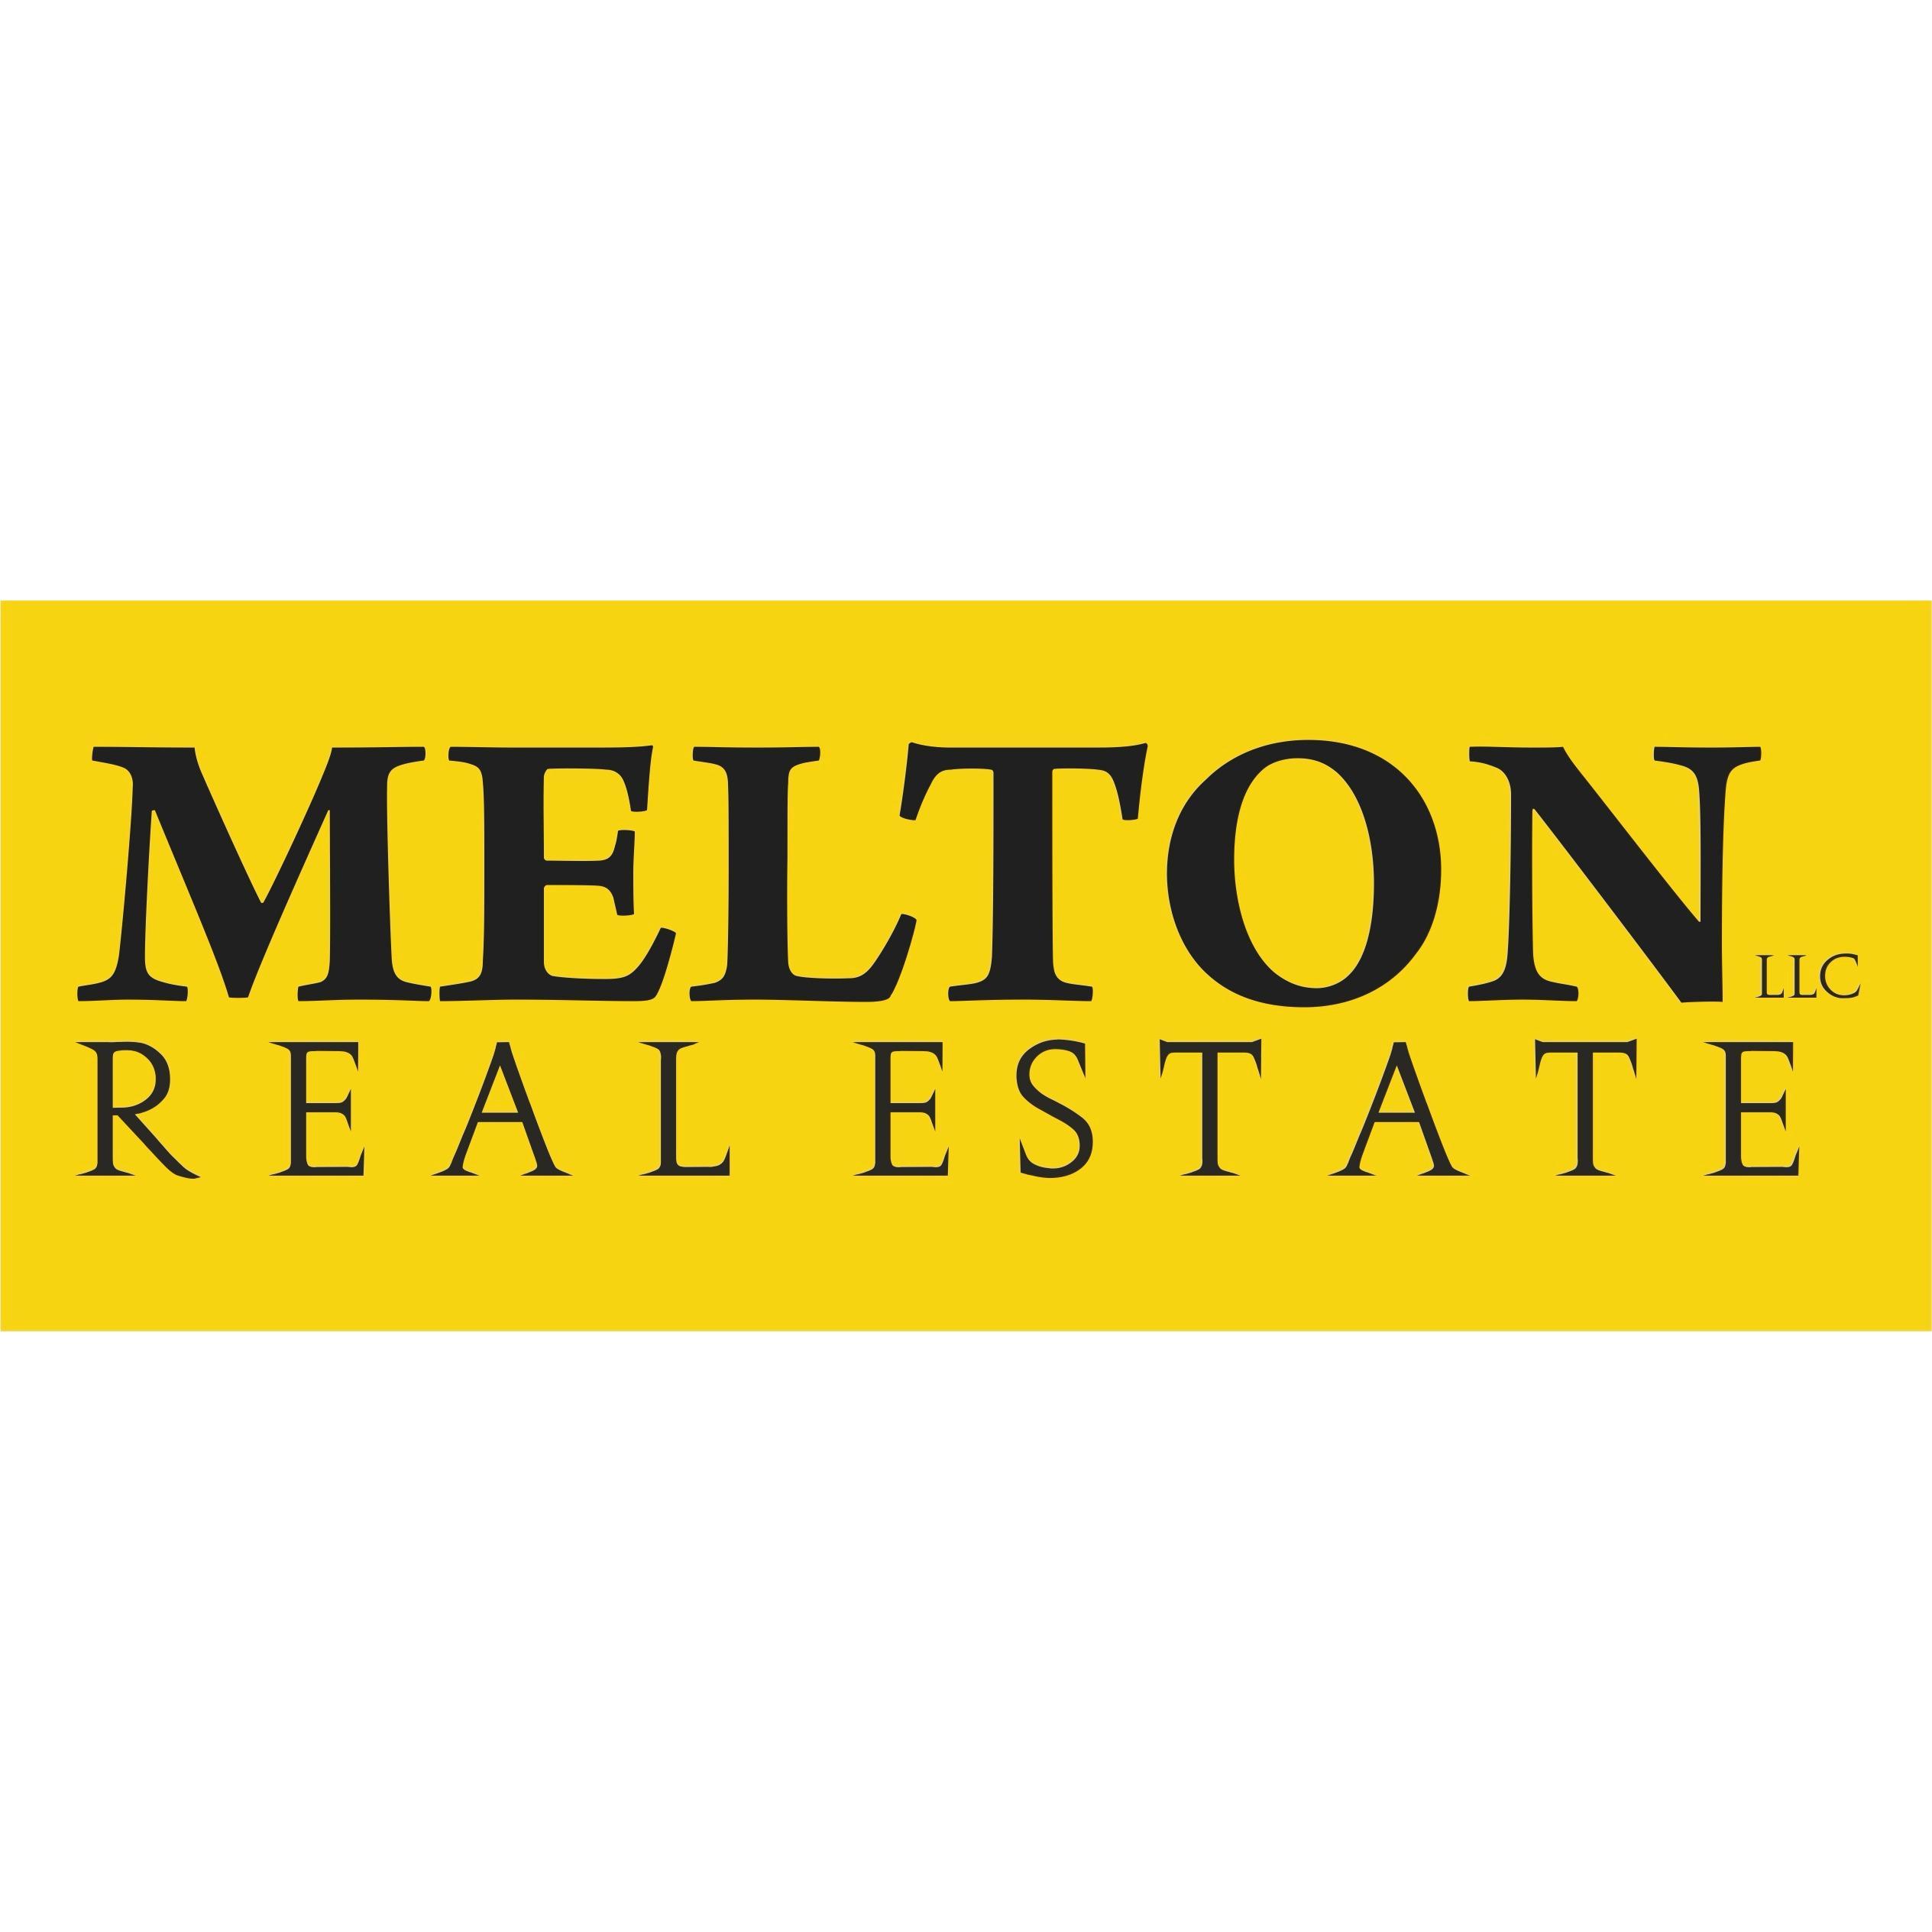 Melton Real Estate - Crittenden, KY - Real Estate Agents